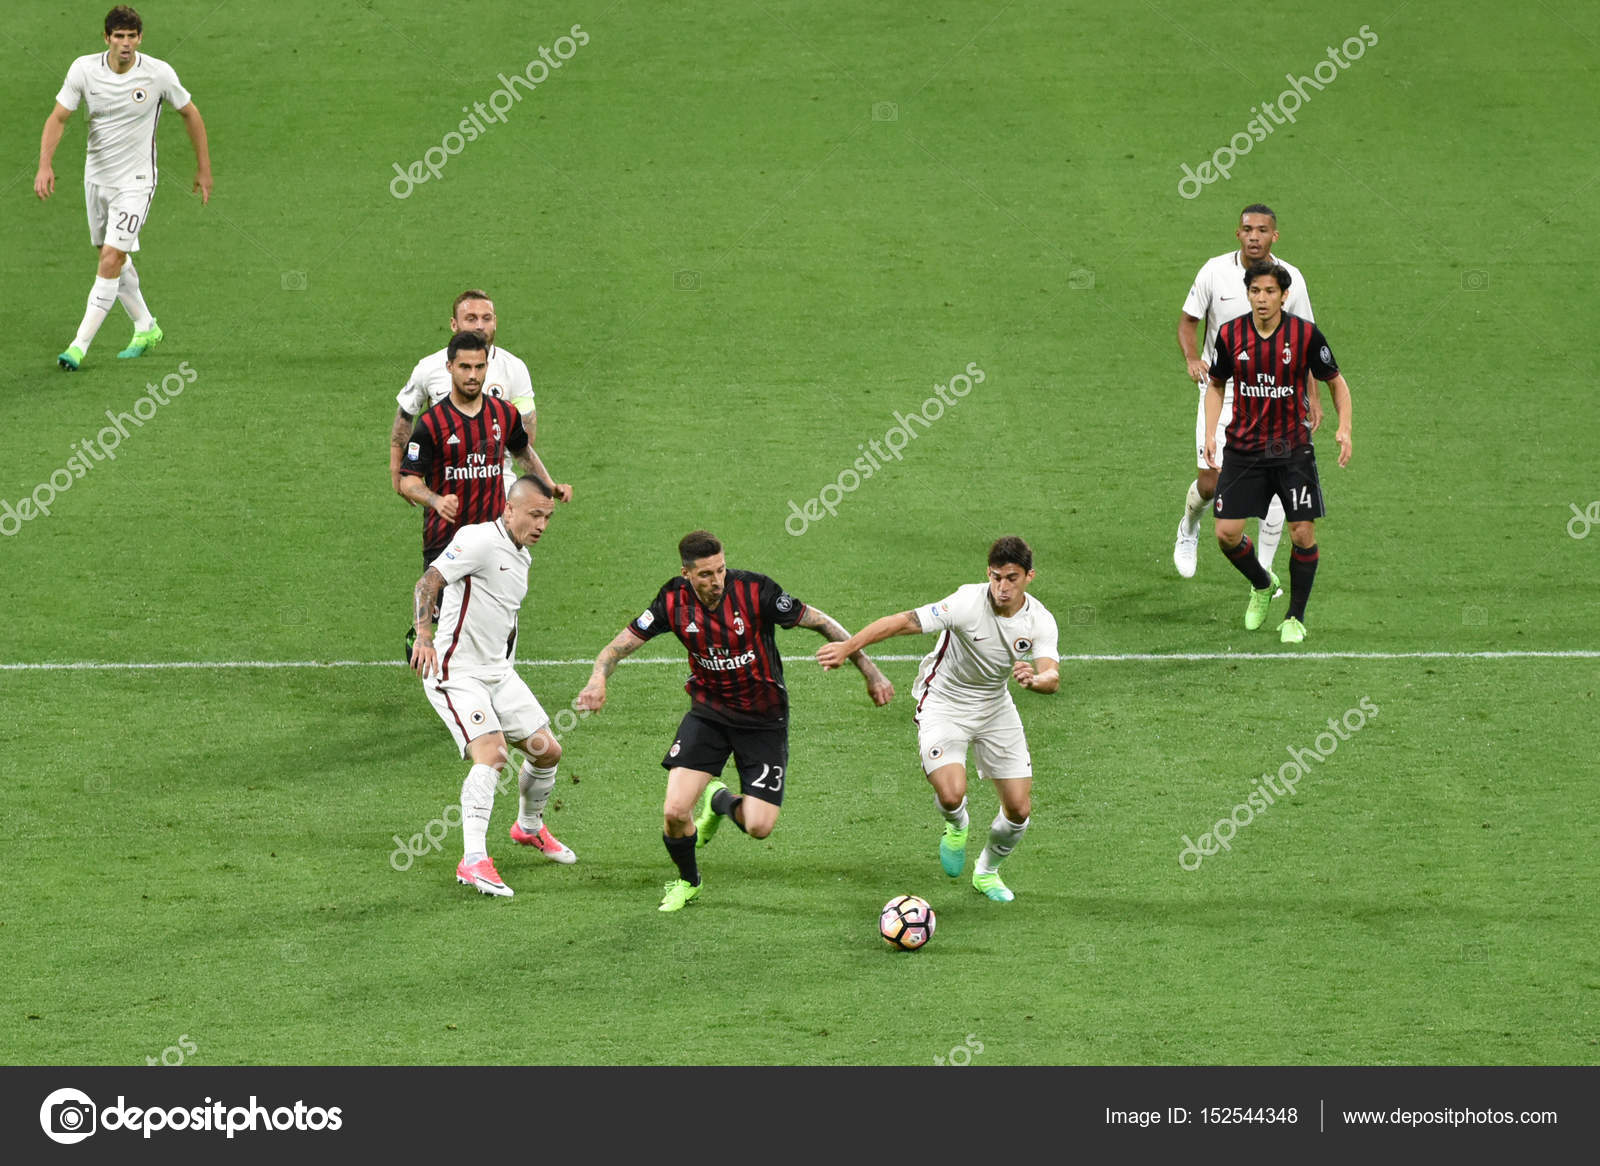 Результат Матча Рома Милан